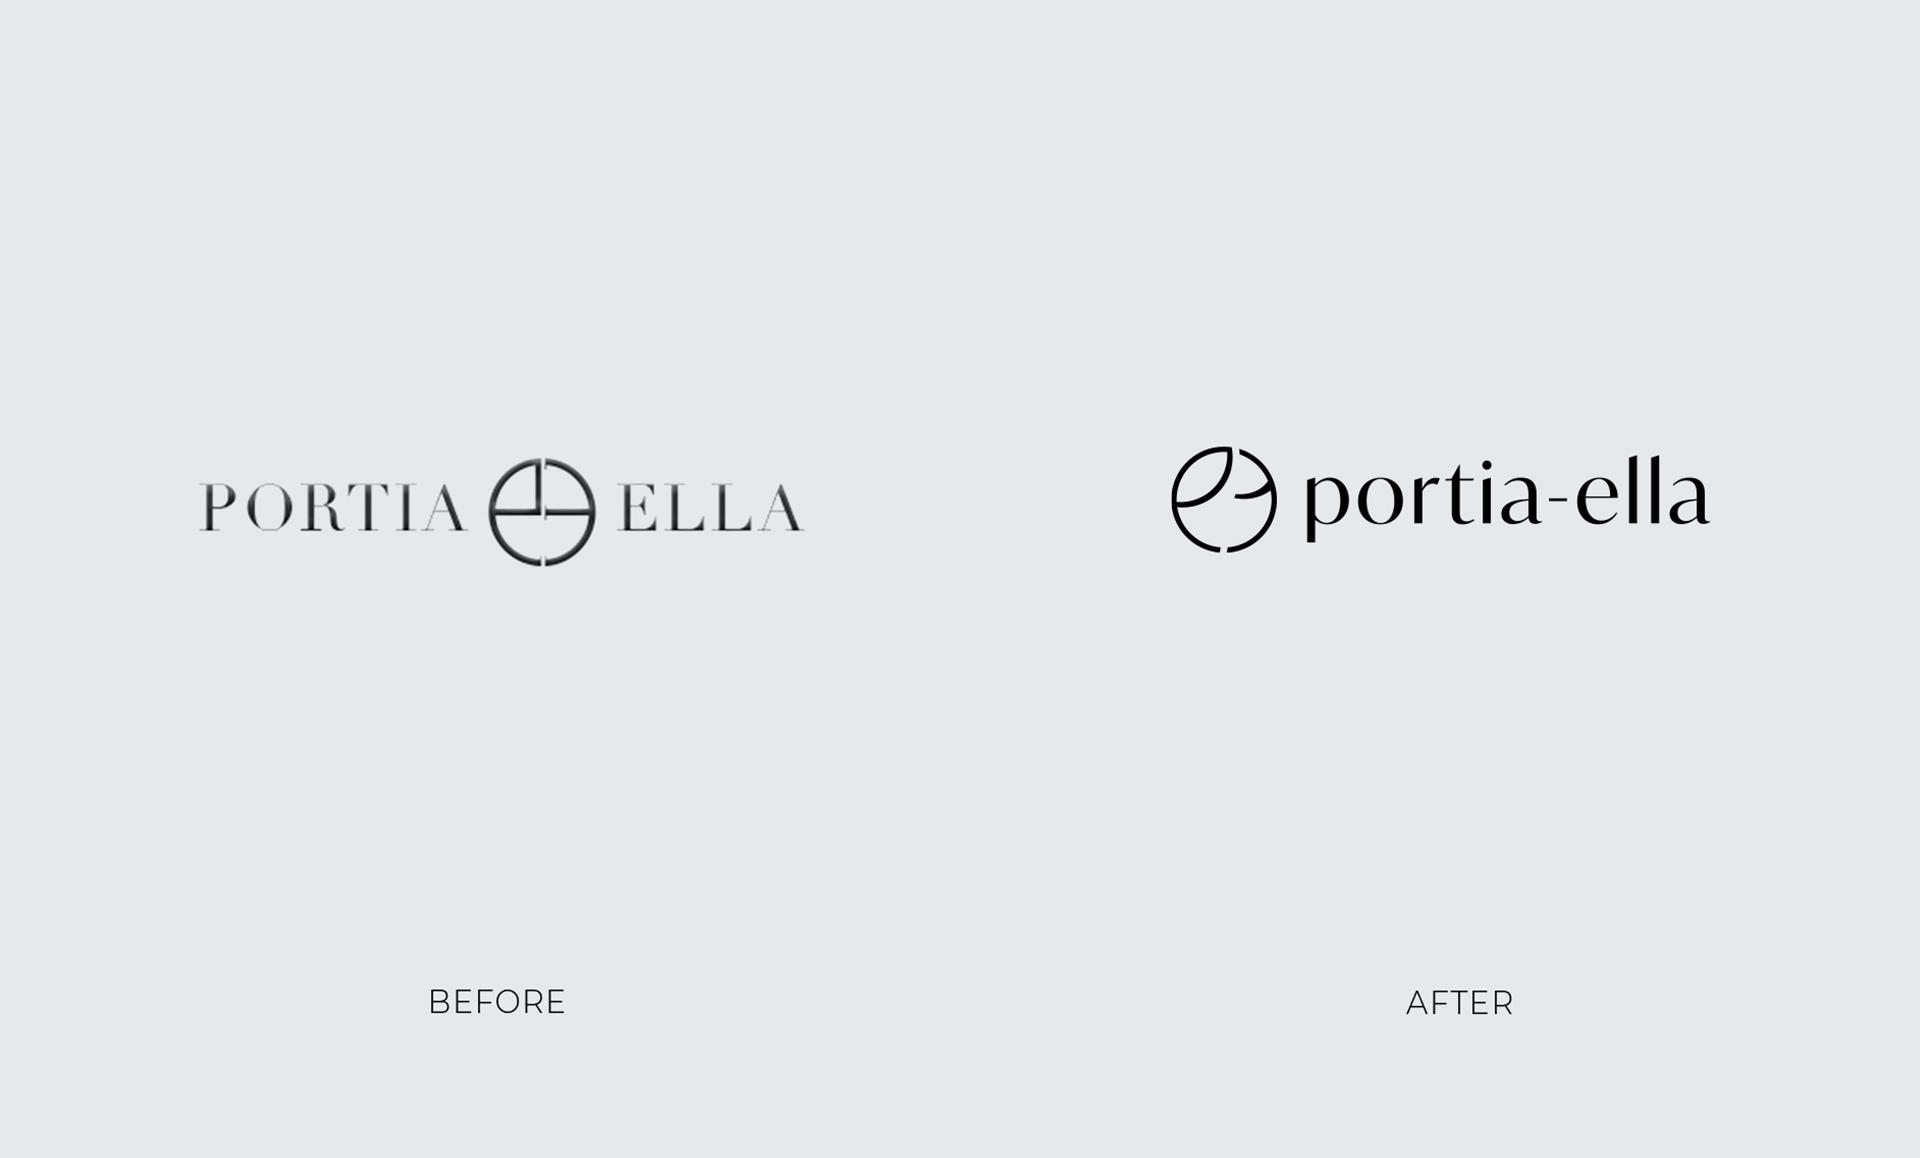 retail marketing portia ella logo redesign